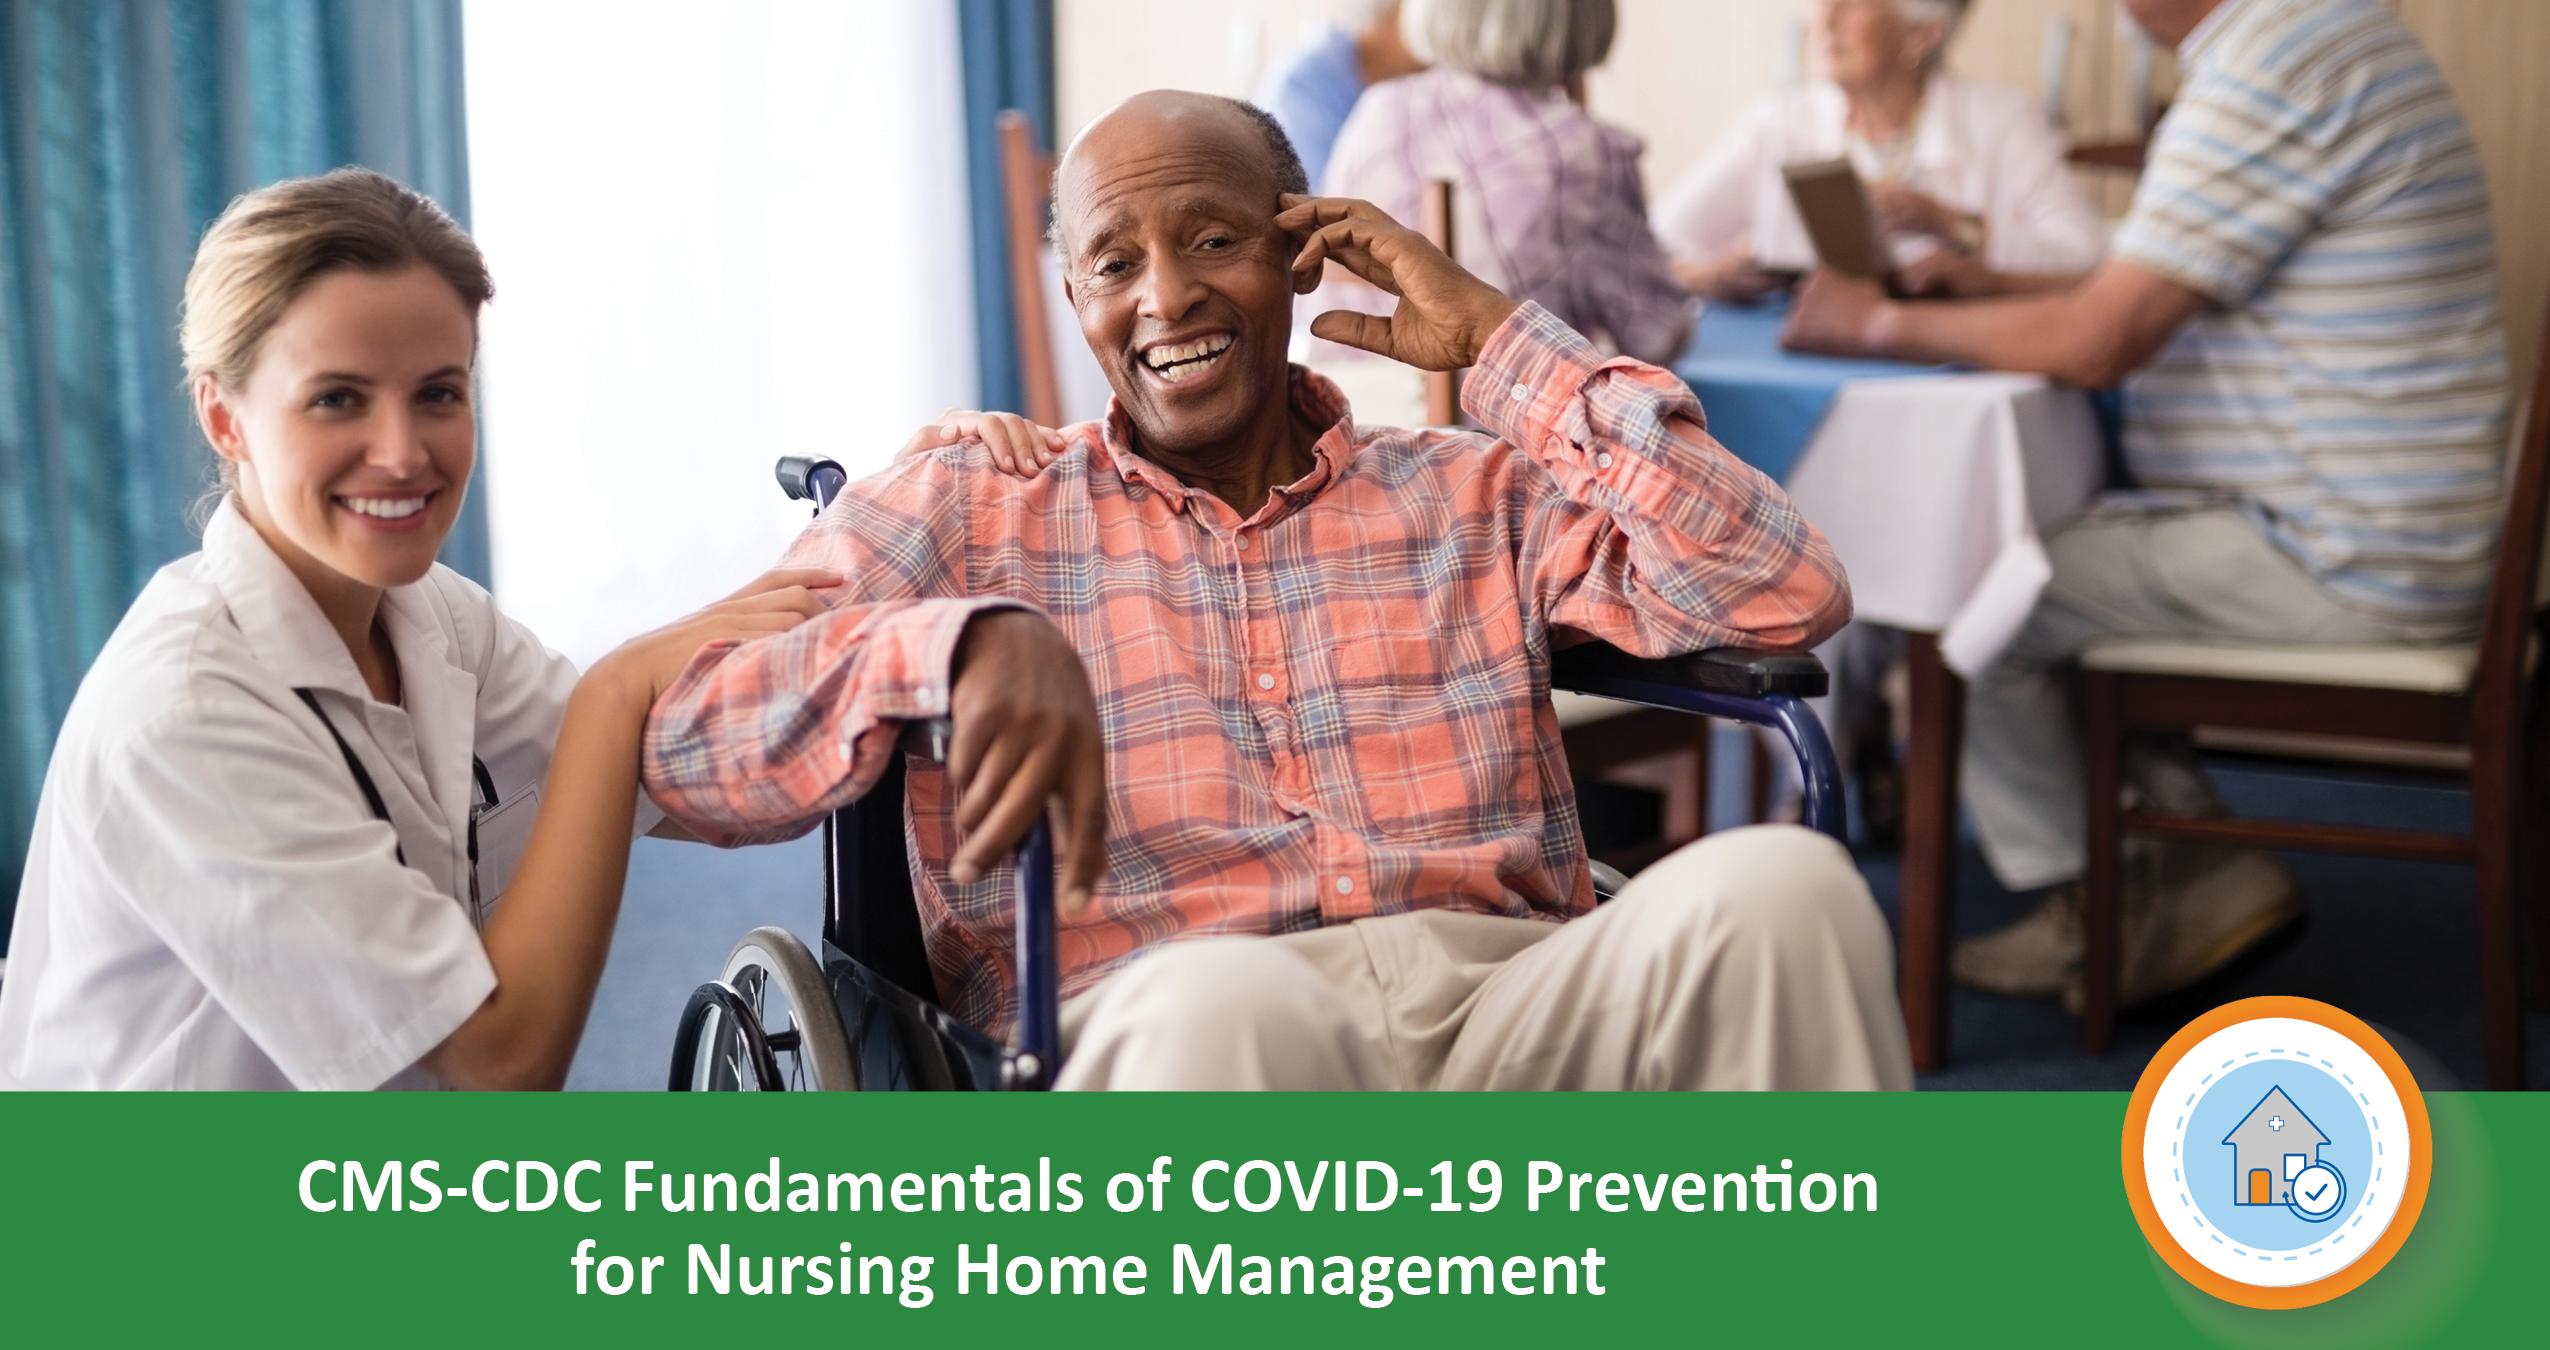 CMS CDC Fundamentals of COVID-19 Prevention for Nursing Home Management